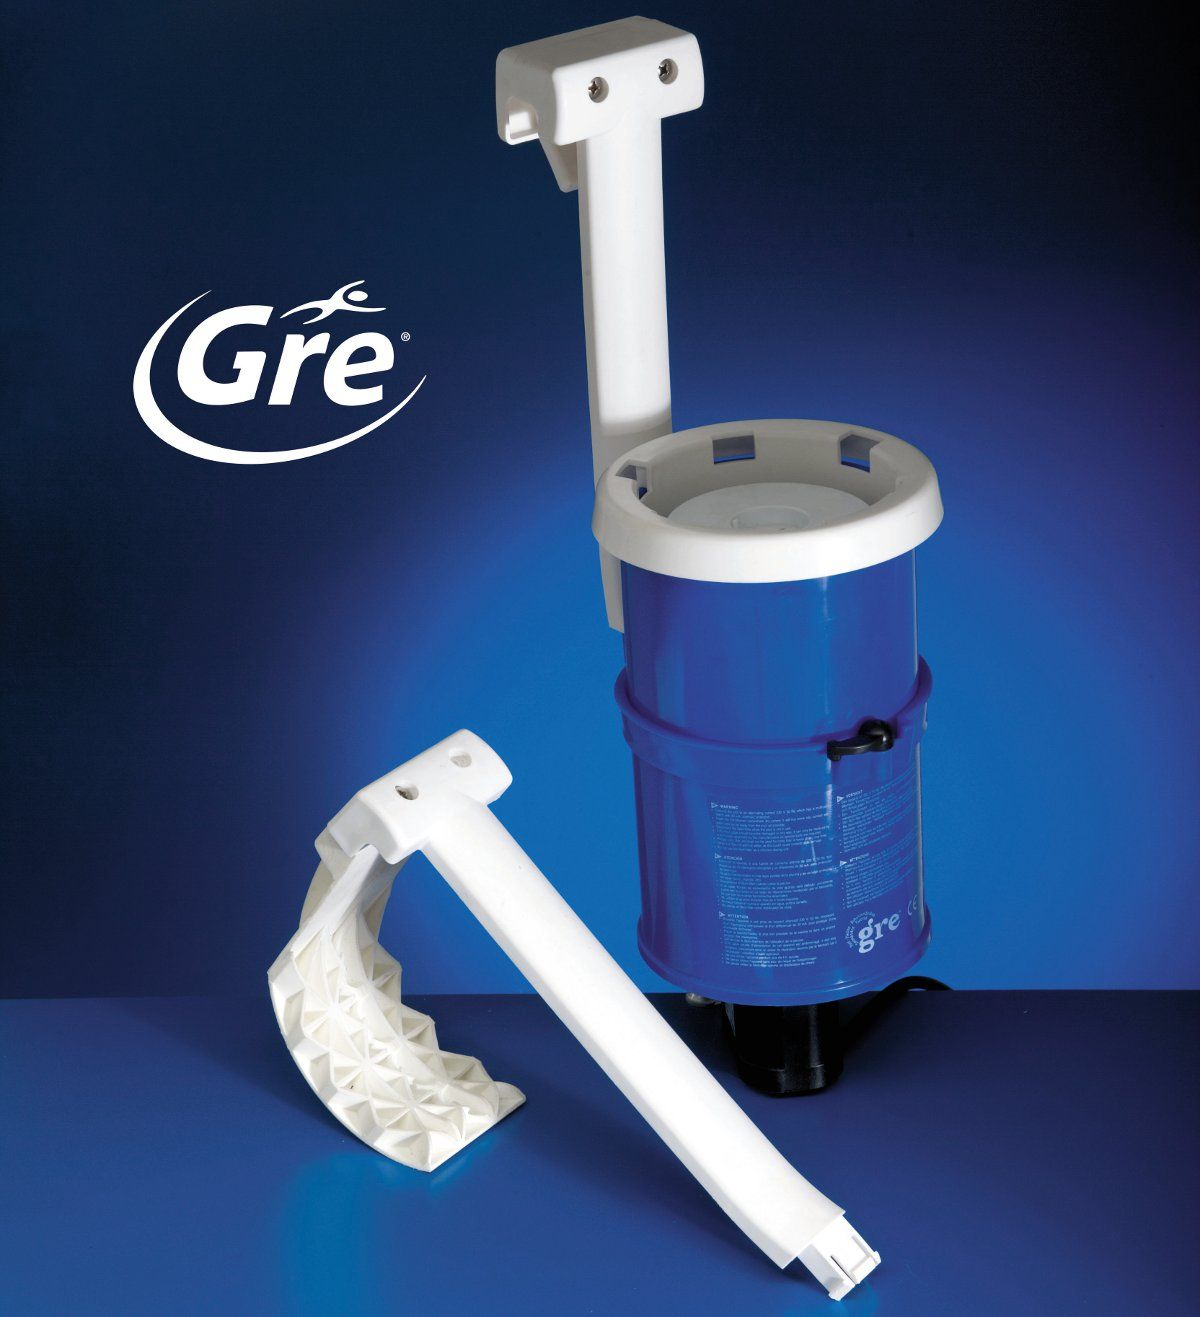 Filtre A Cartouche Immerge Gre 2m3 H P 72w Filtre Piscine Filtre A Sable